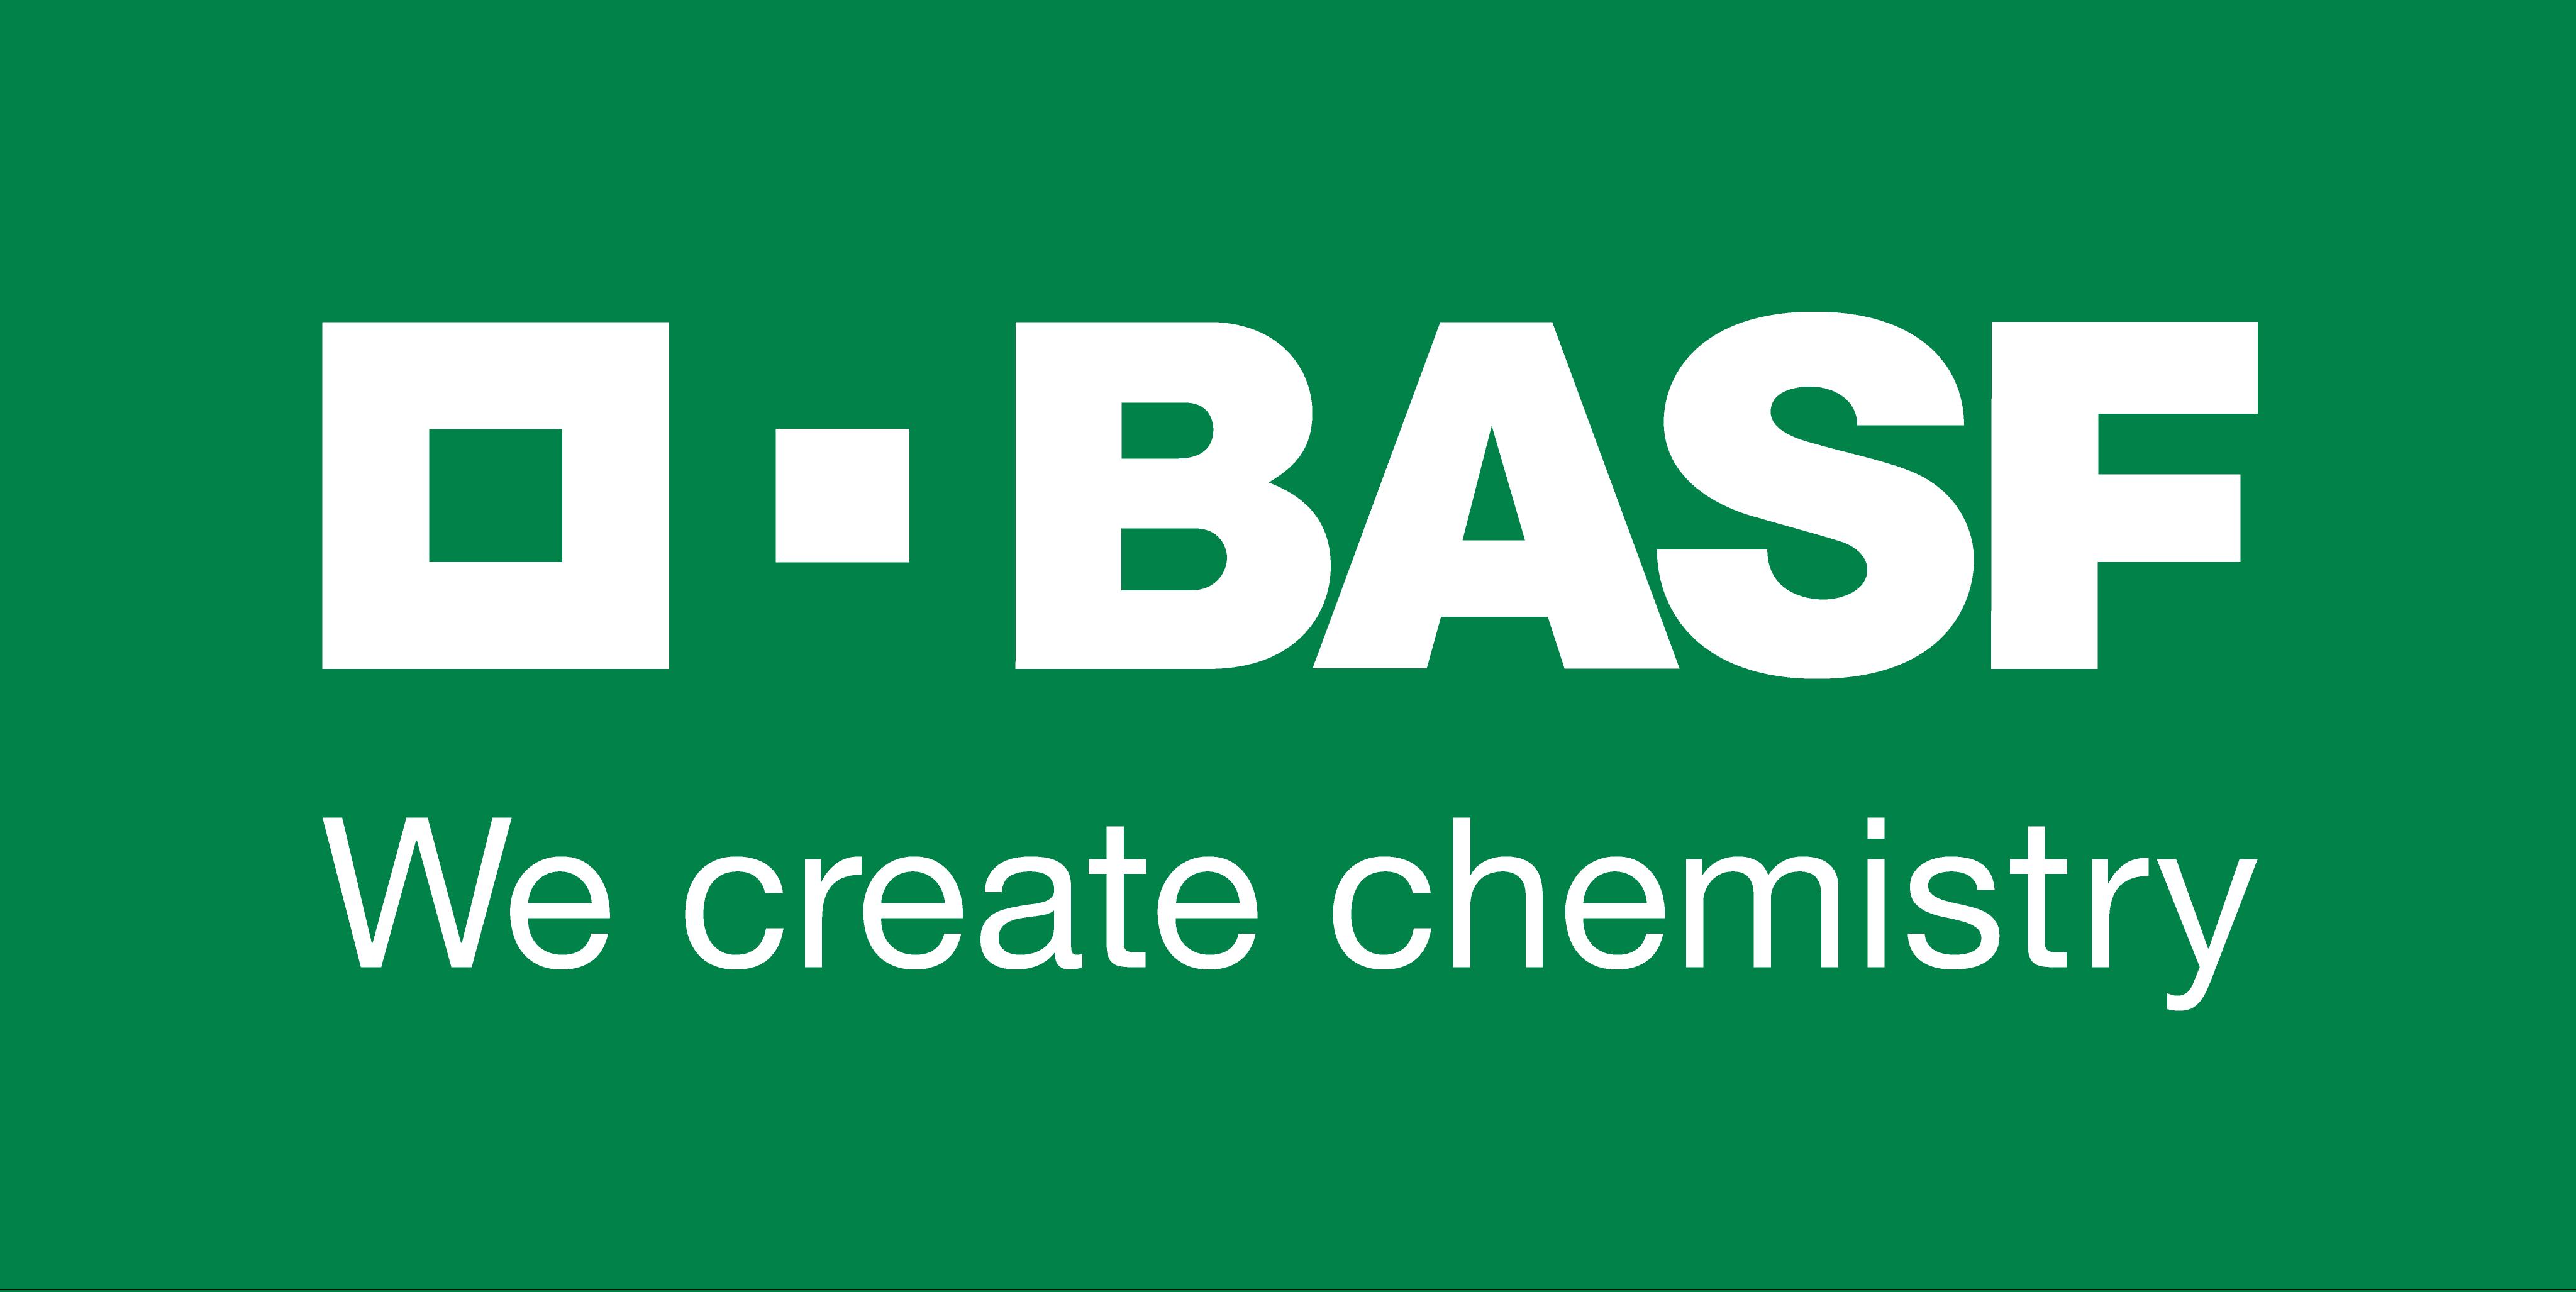 basf logo 7 - BASF Logo